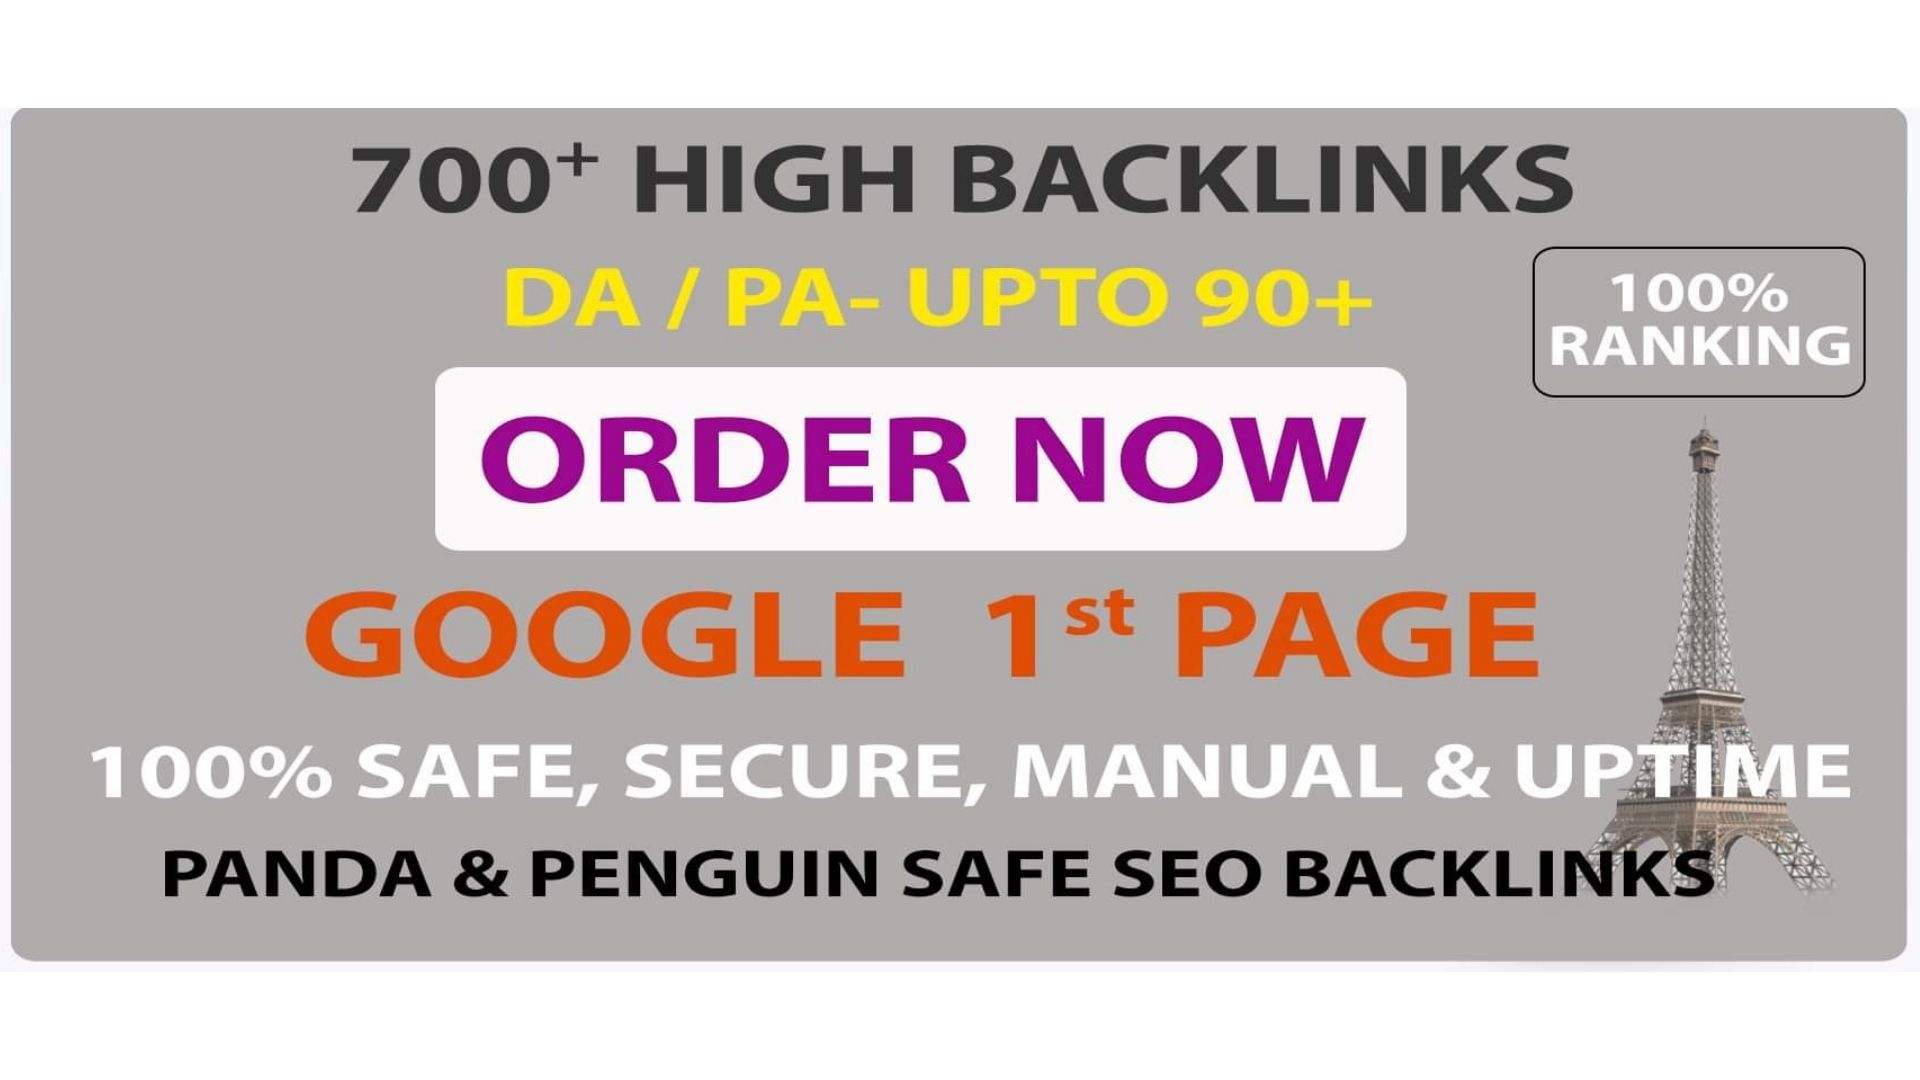 Get 700+ High DA 60+ PBN Backlink to Rank Your Website by better solution.